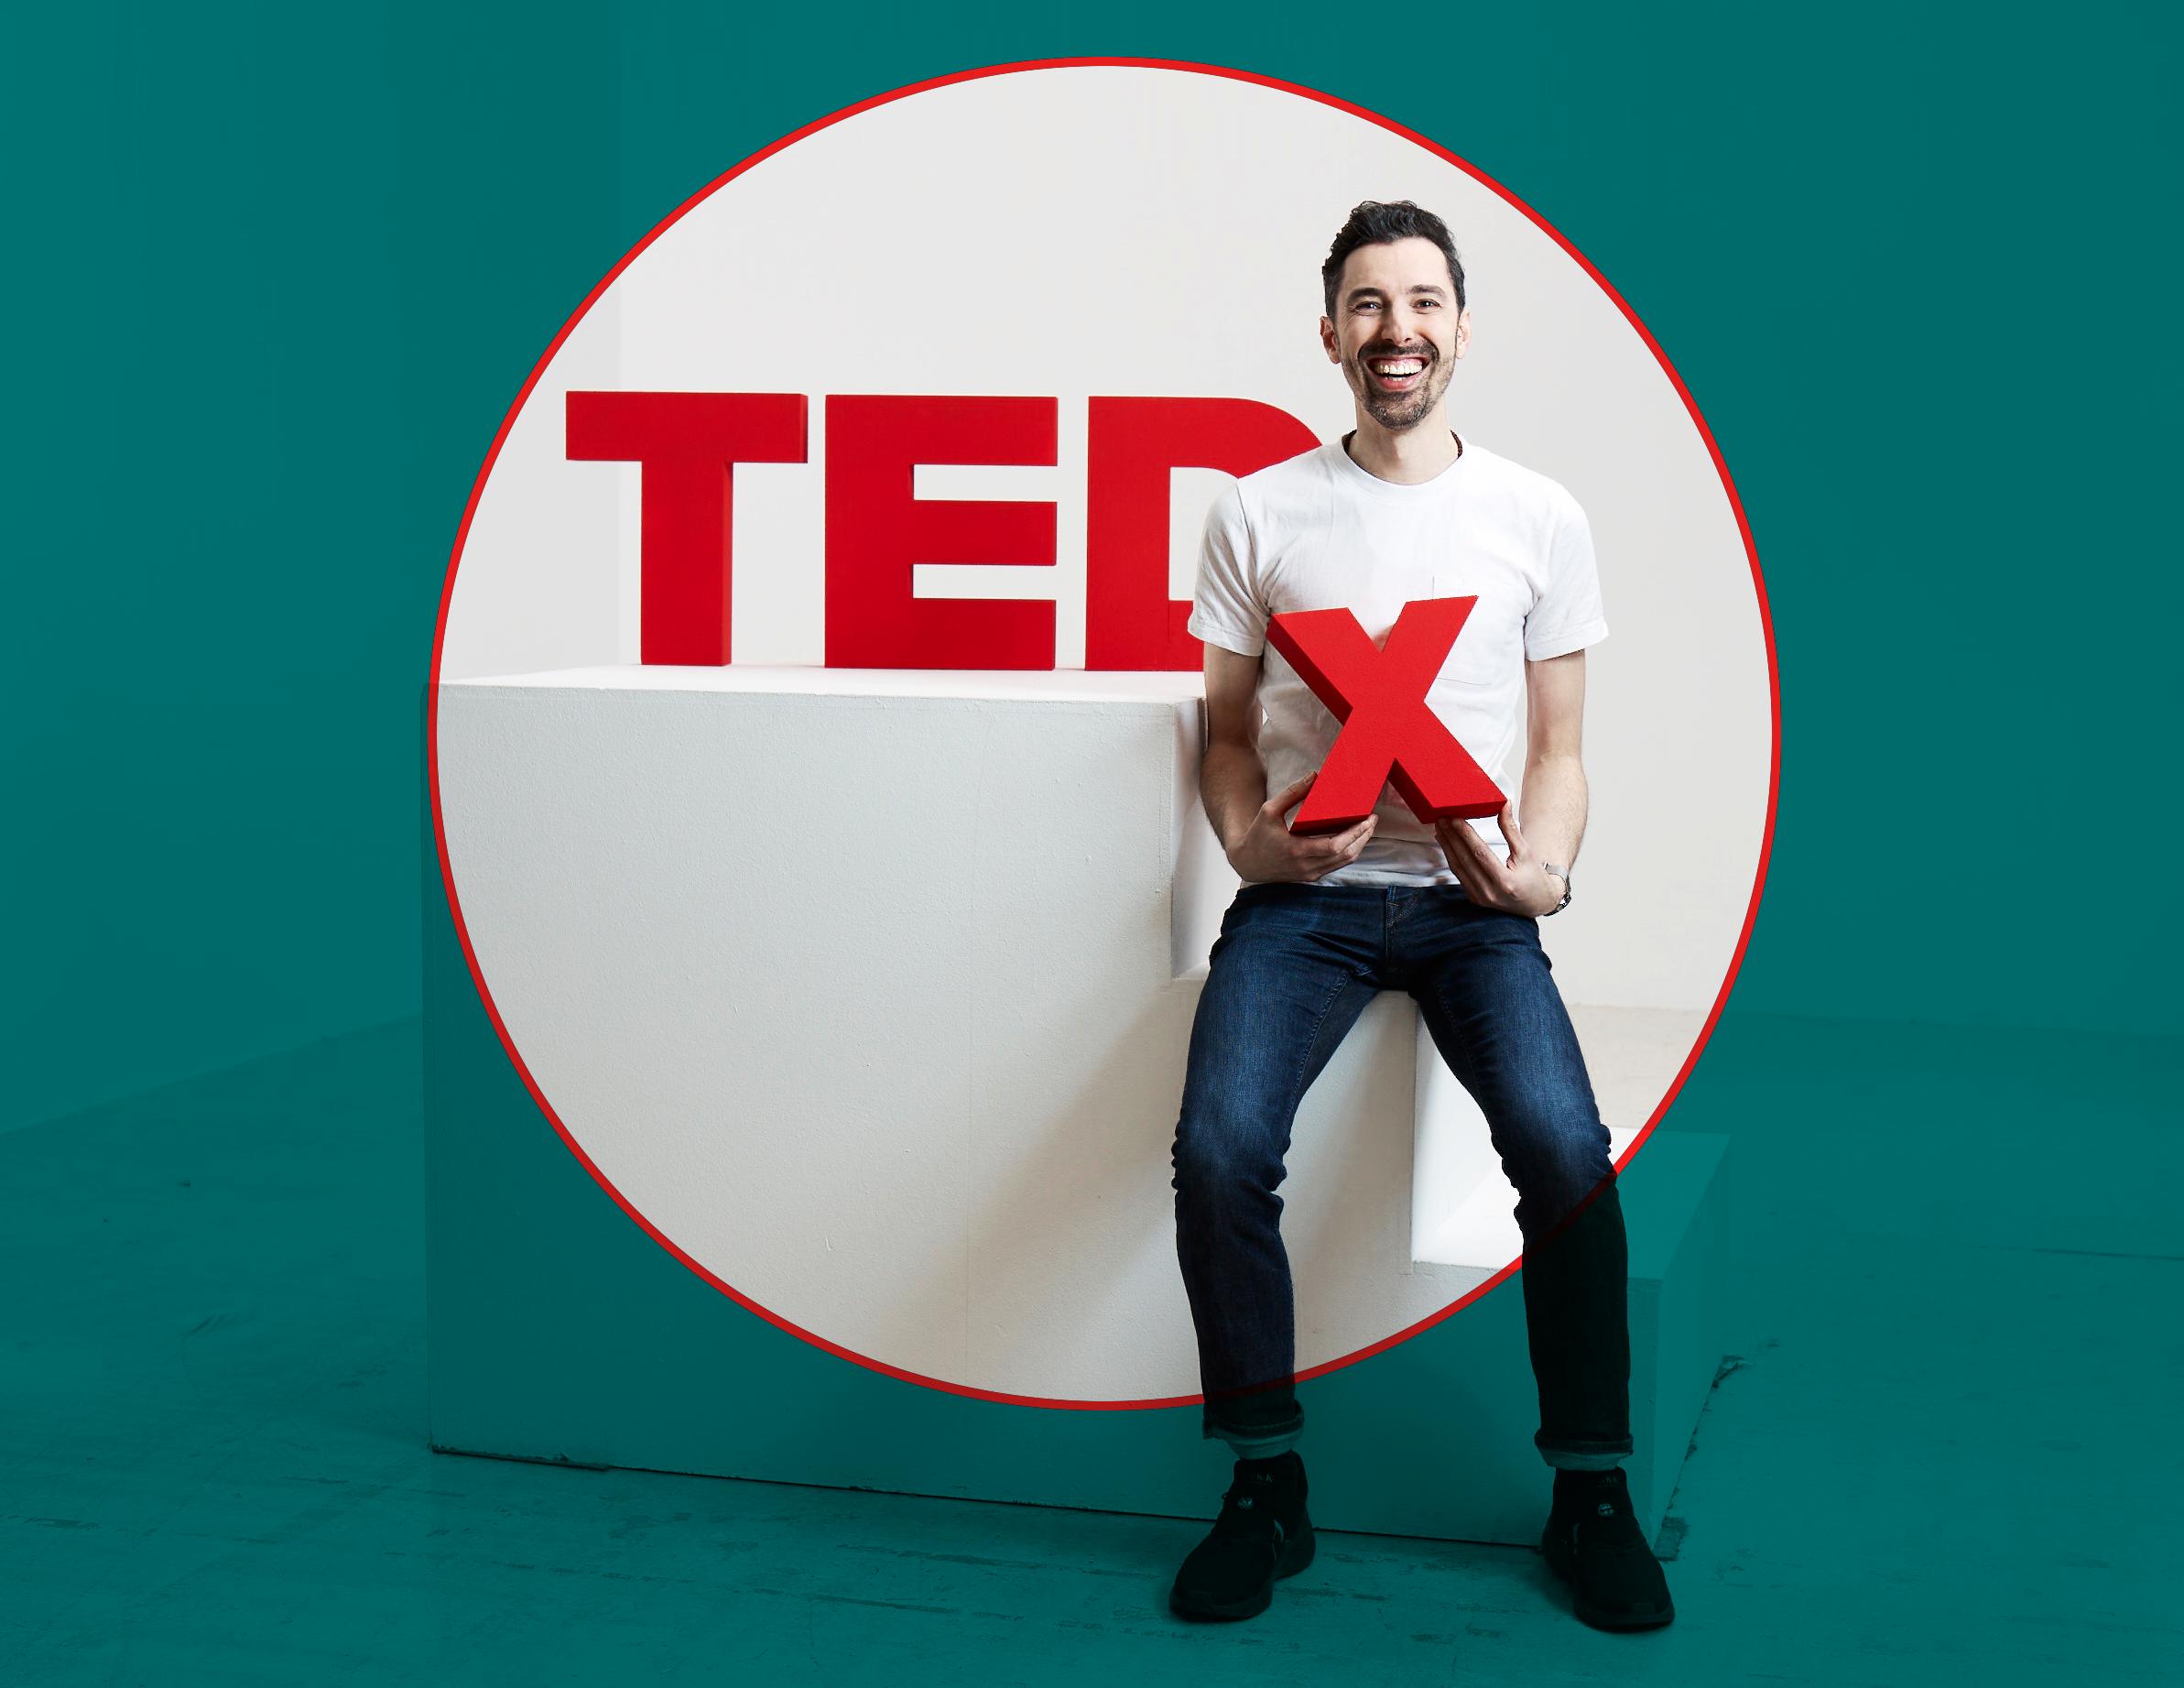 VIVID_TEDx_Christian Reich.png